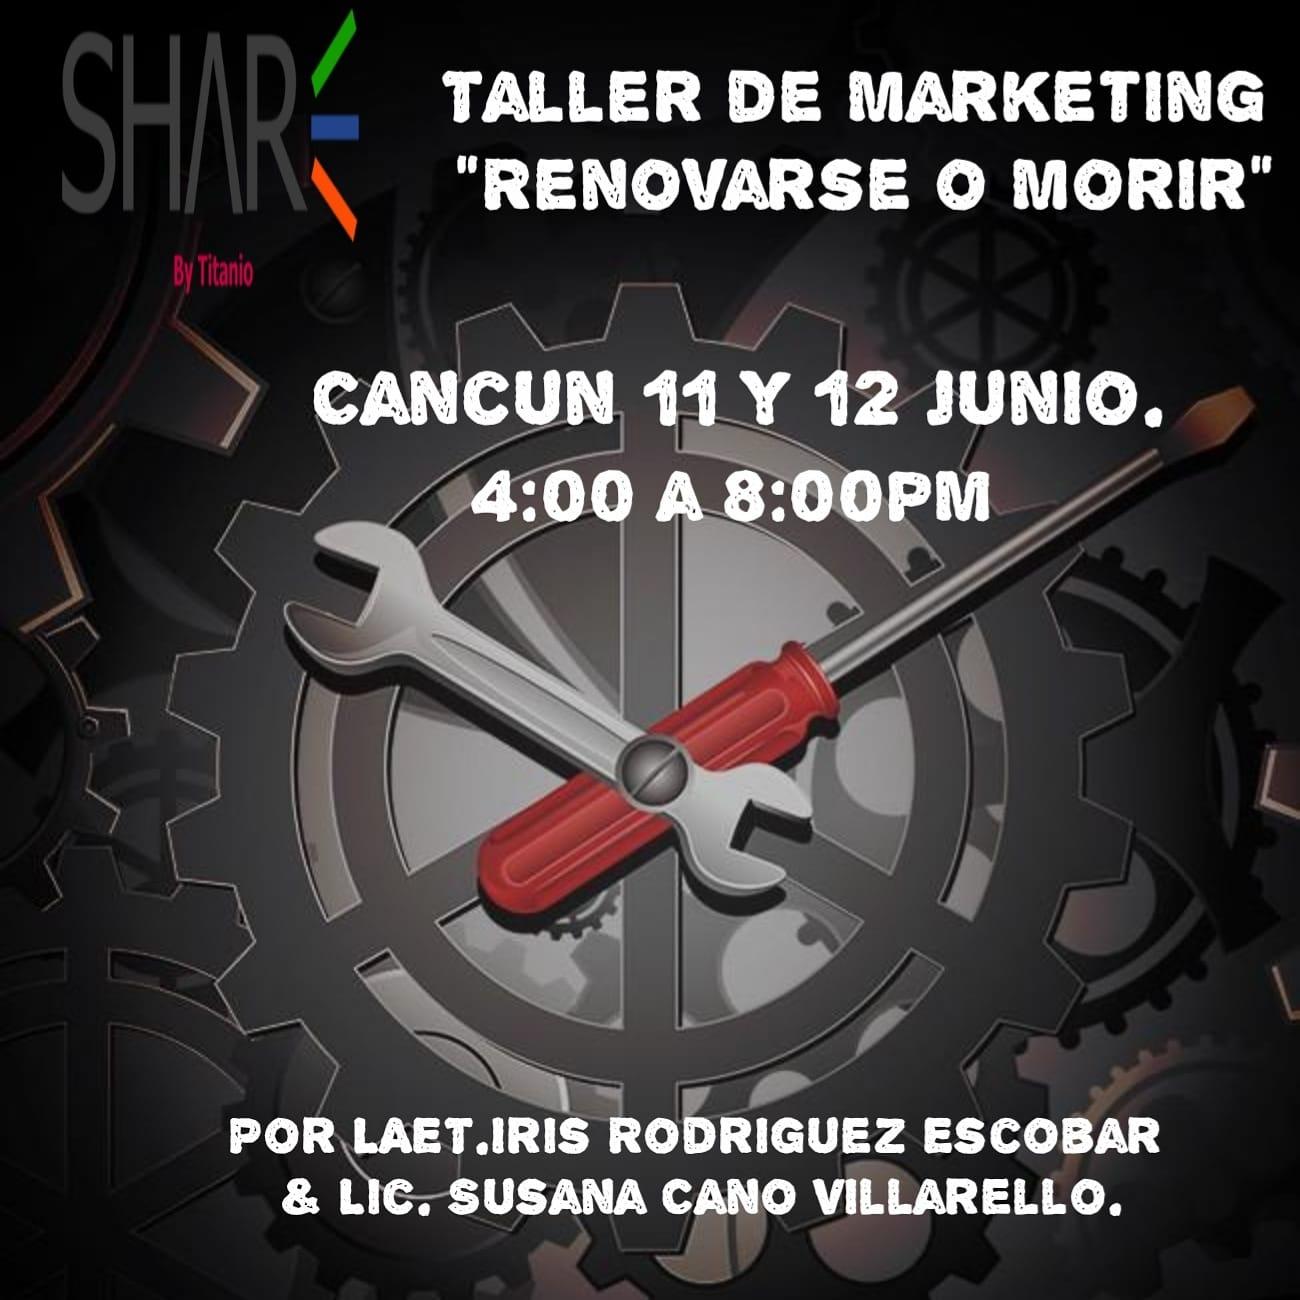 Taller de Marketing Renovarse o Morir, Cancun 11 y 12 de Junio por Iris Rodriguez Escobar